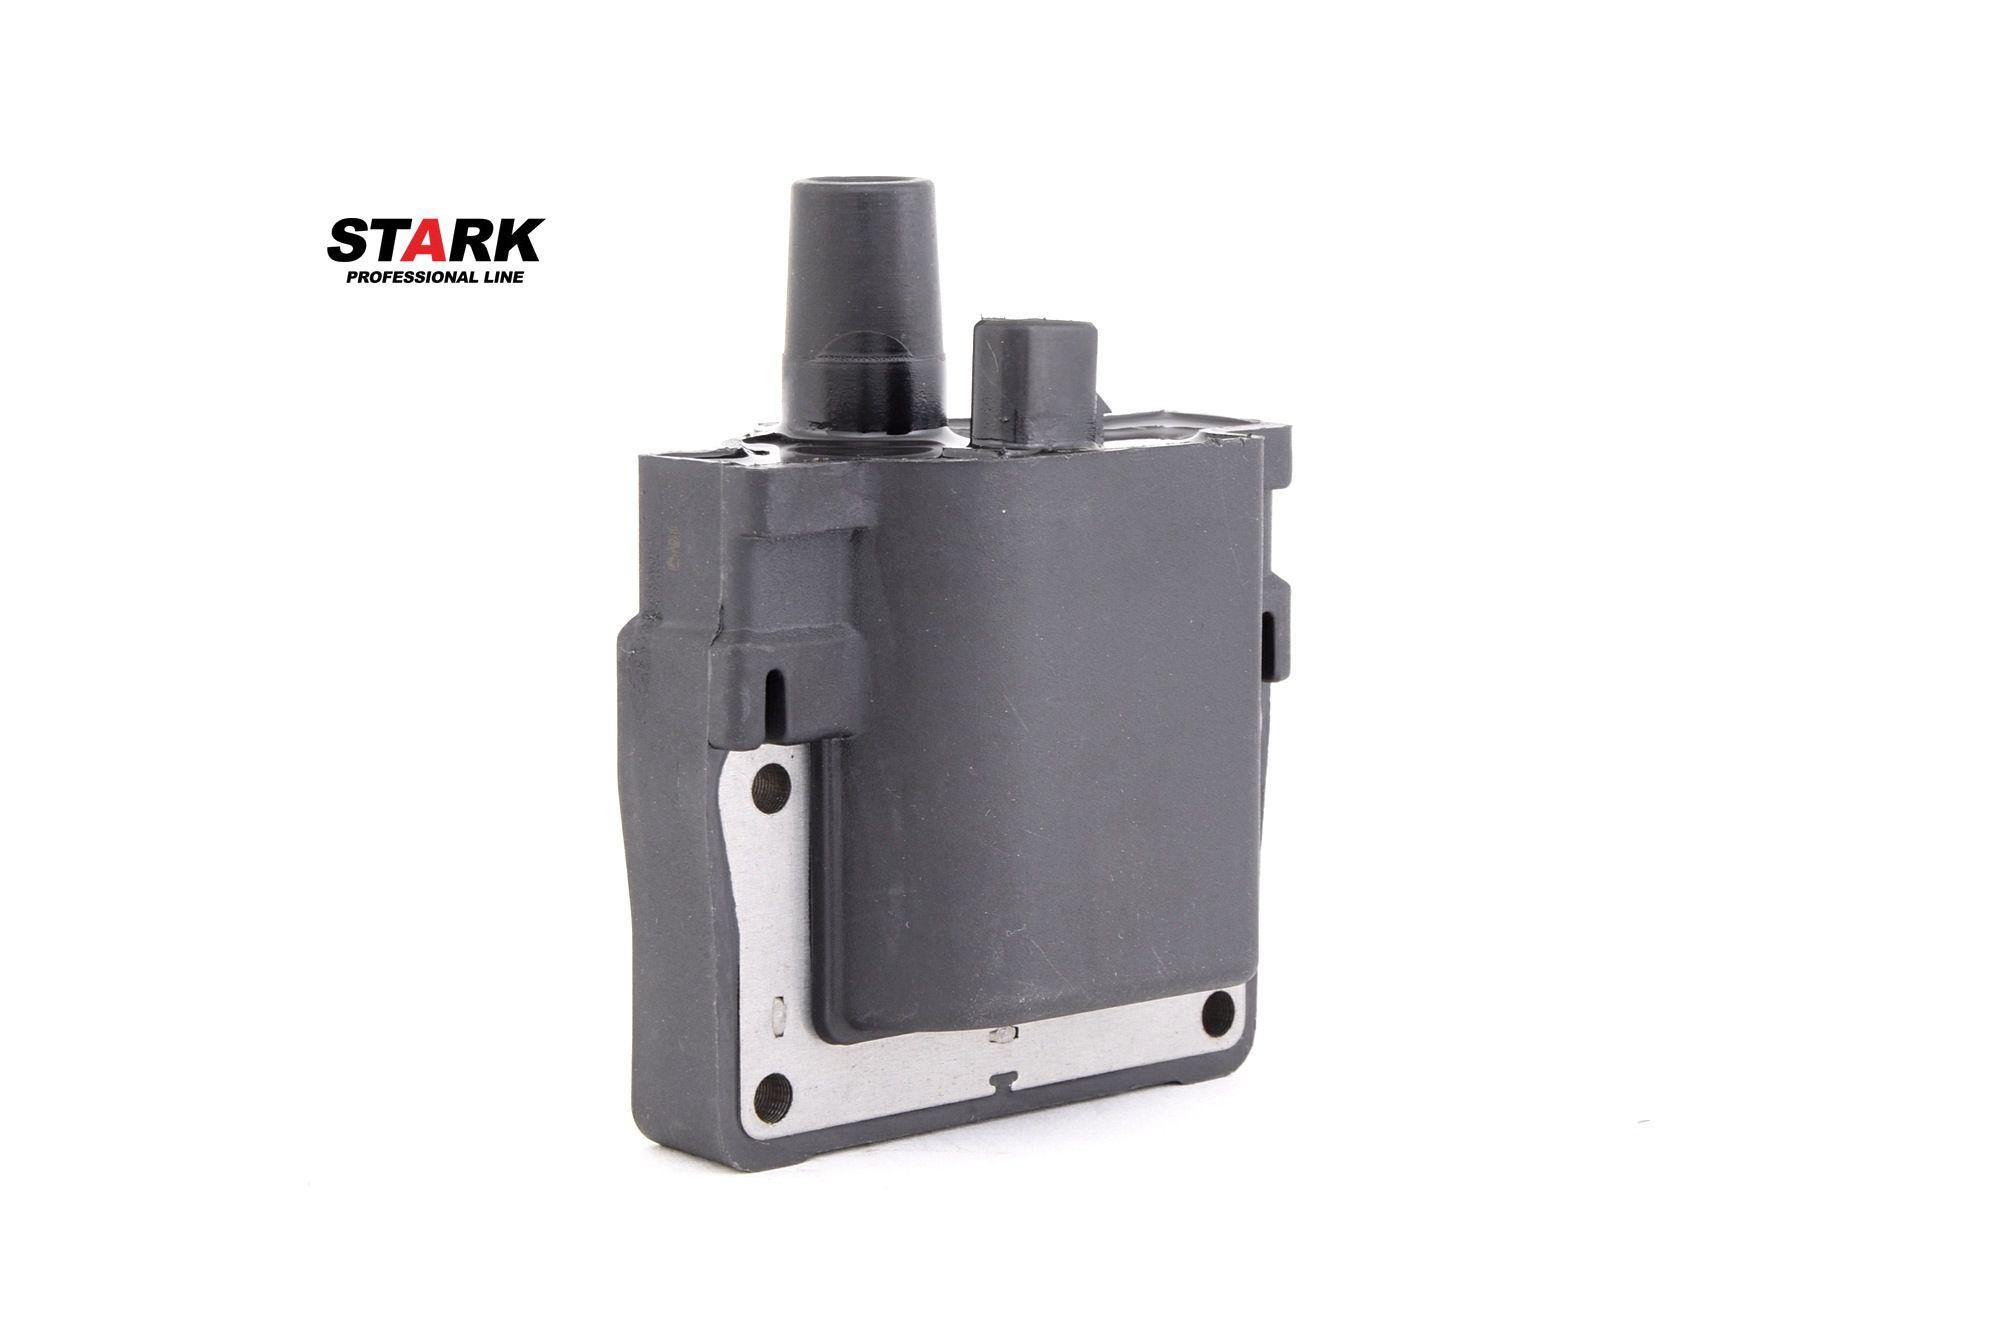 Zündspule STARK SKCO-0070104 Bewertung